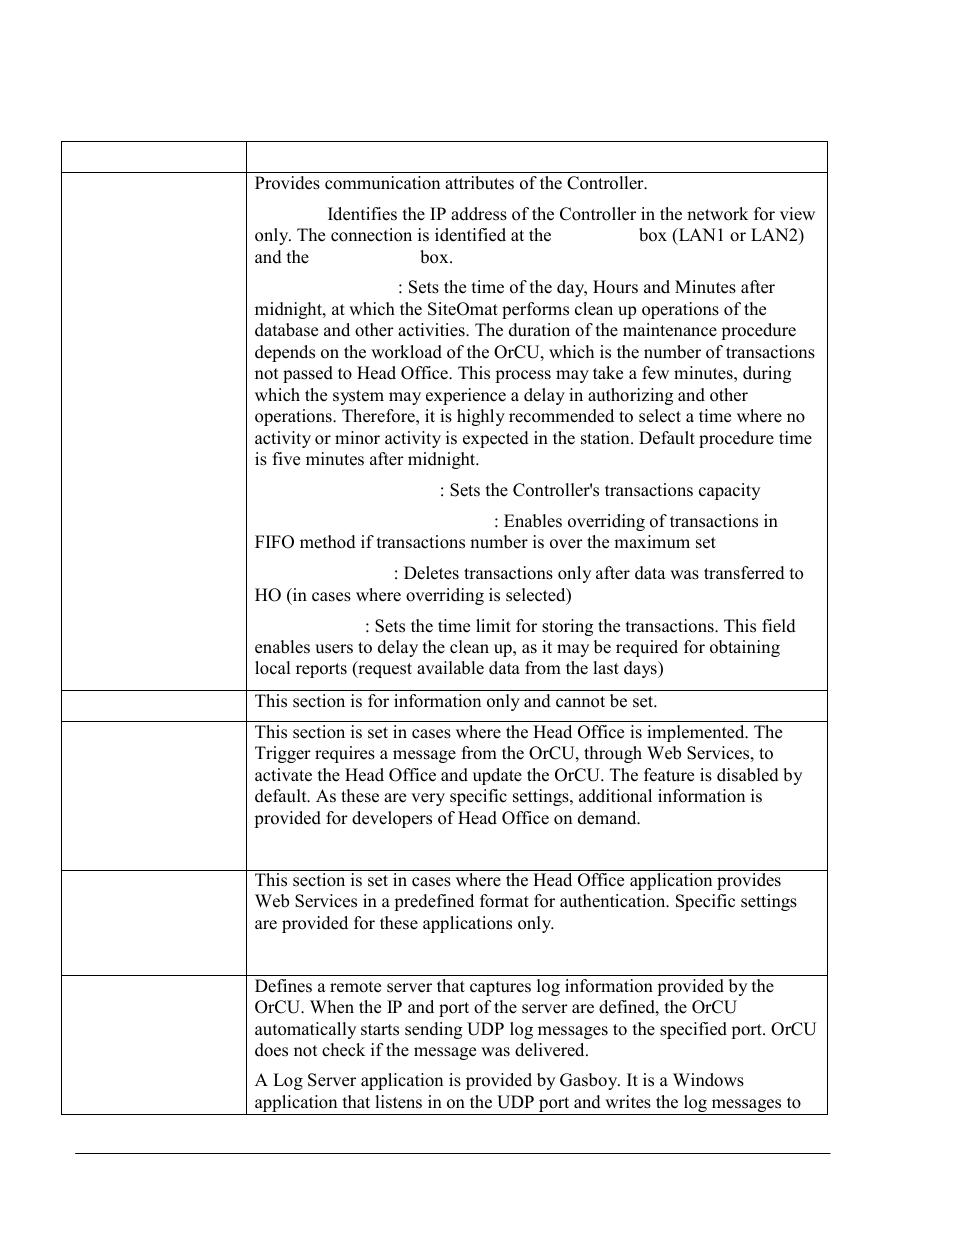 gasboy siteomat maintenance manual user manual page 128 298 rh manualsdir com Aircraft MAINTEANCE Manuals Service Manuals